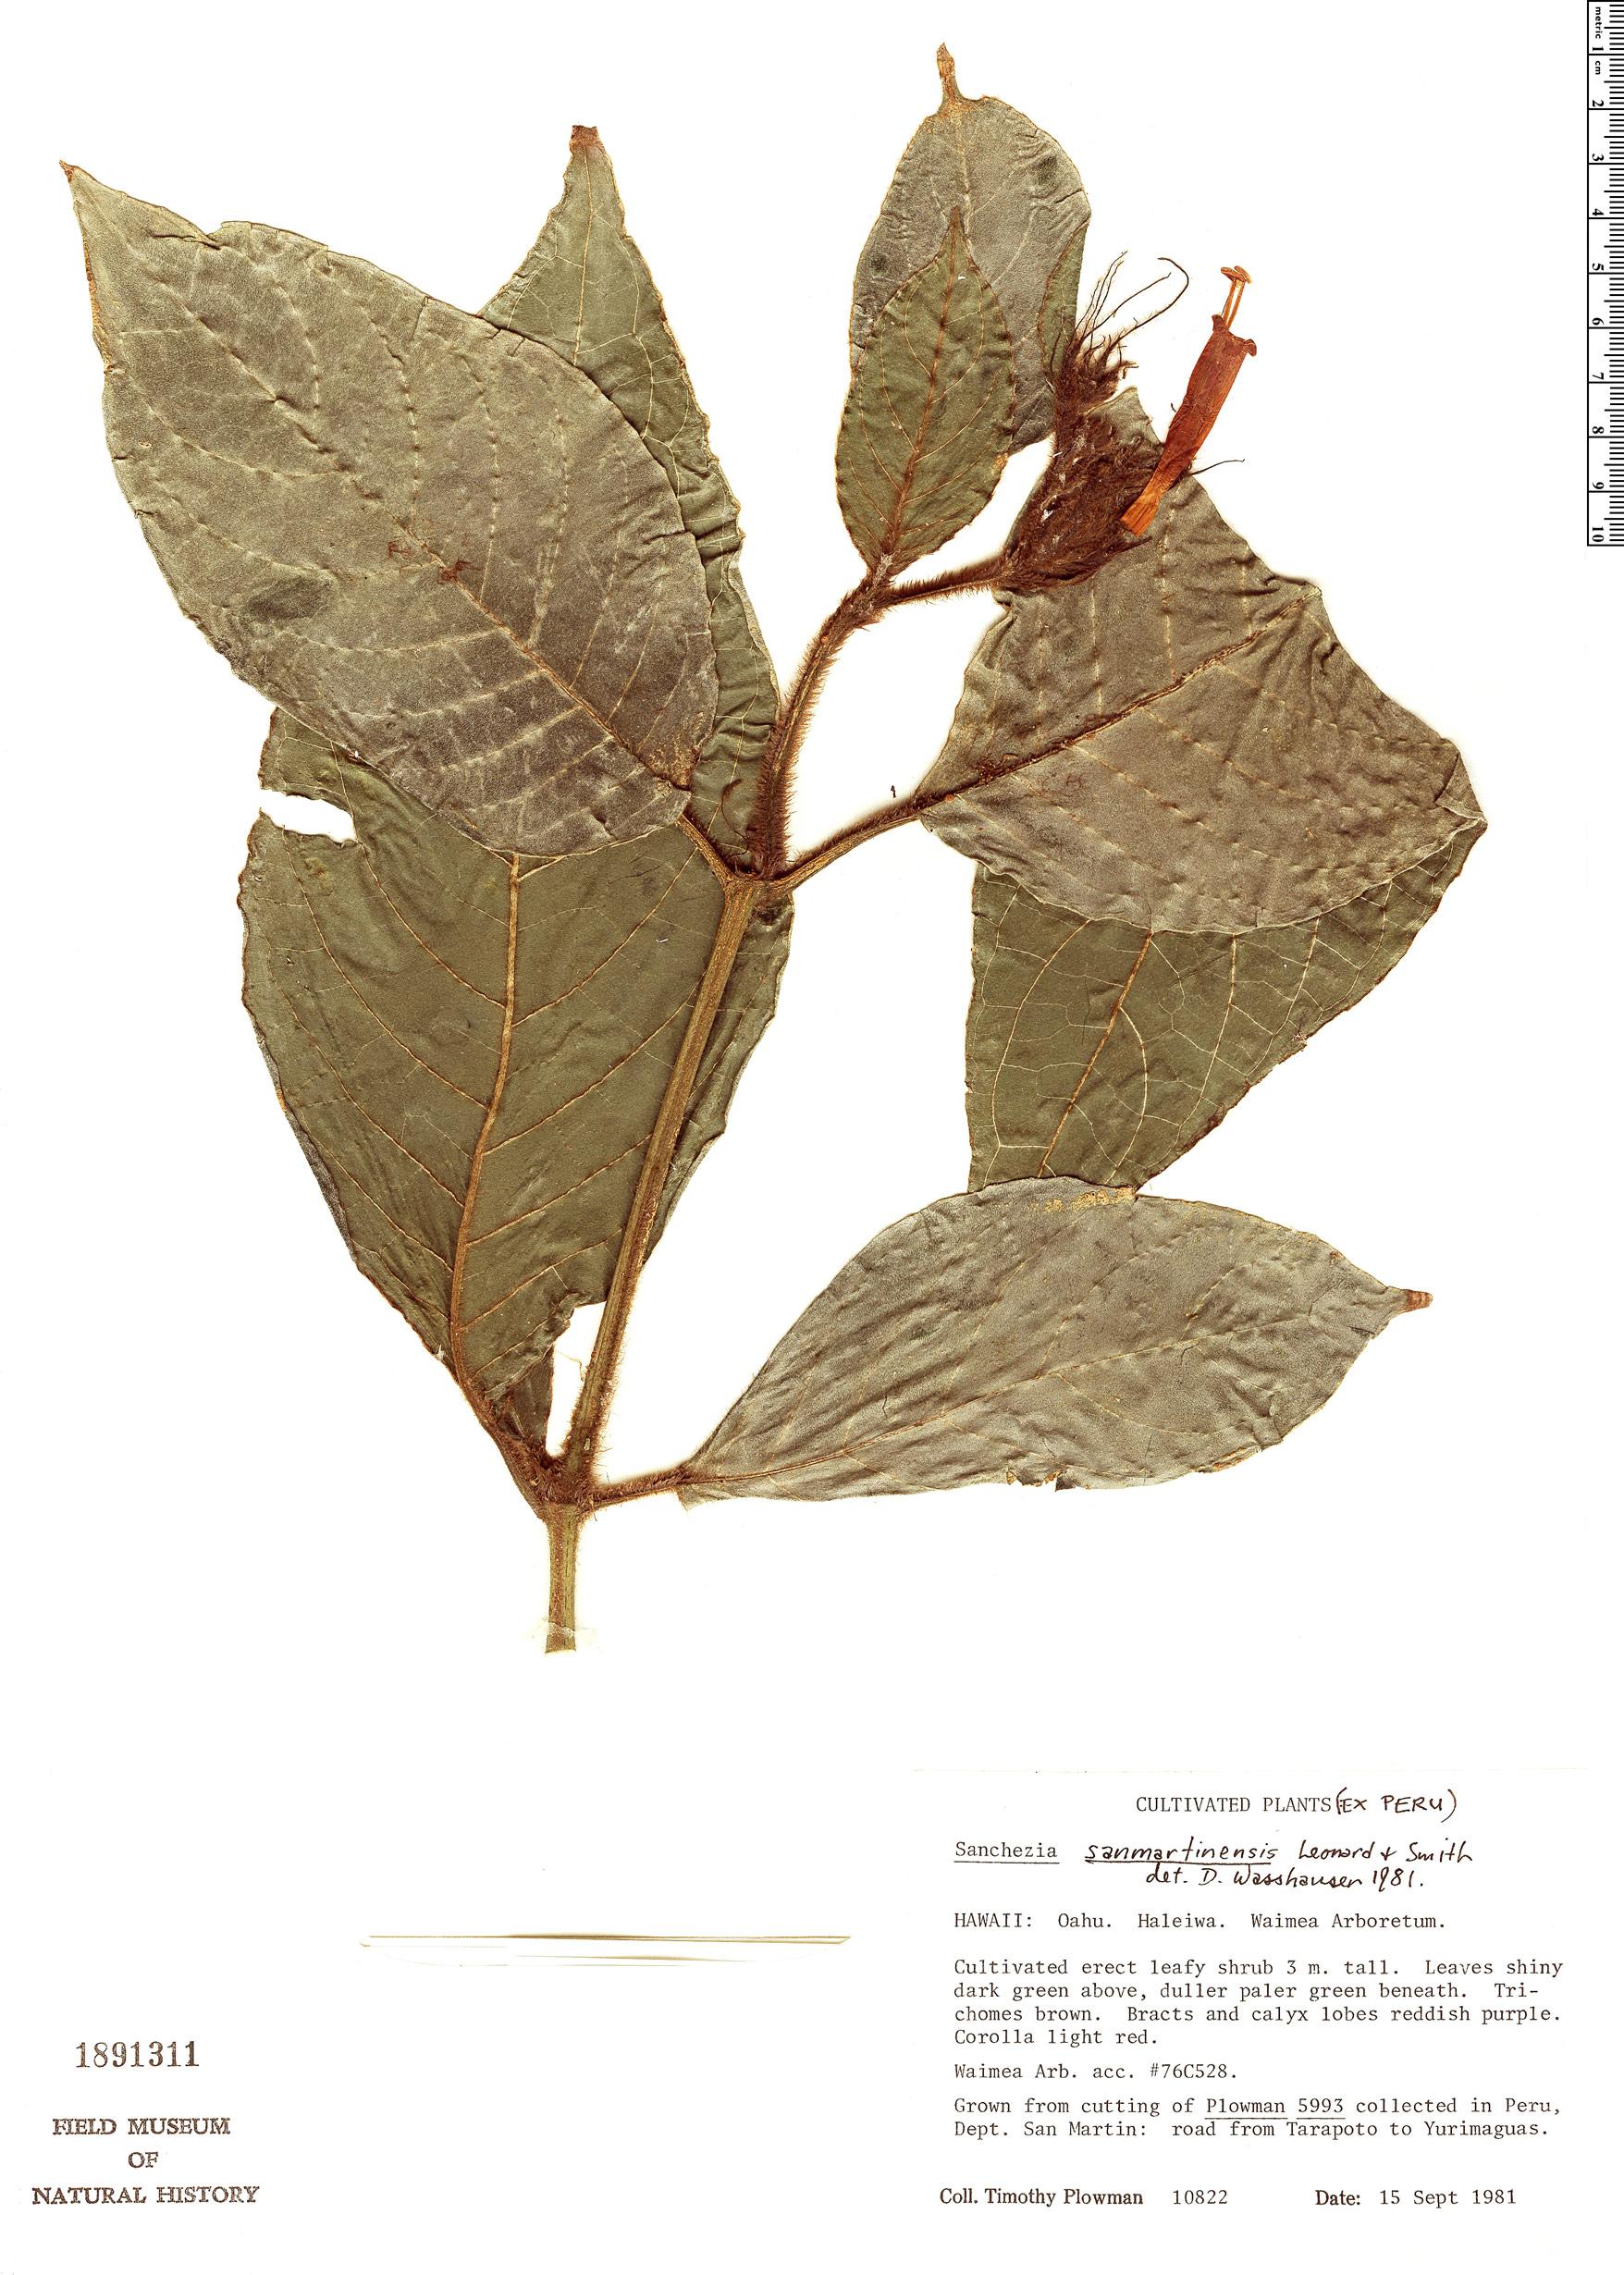 Specimen: Sanchezia sanmartinensis